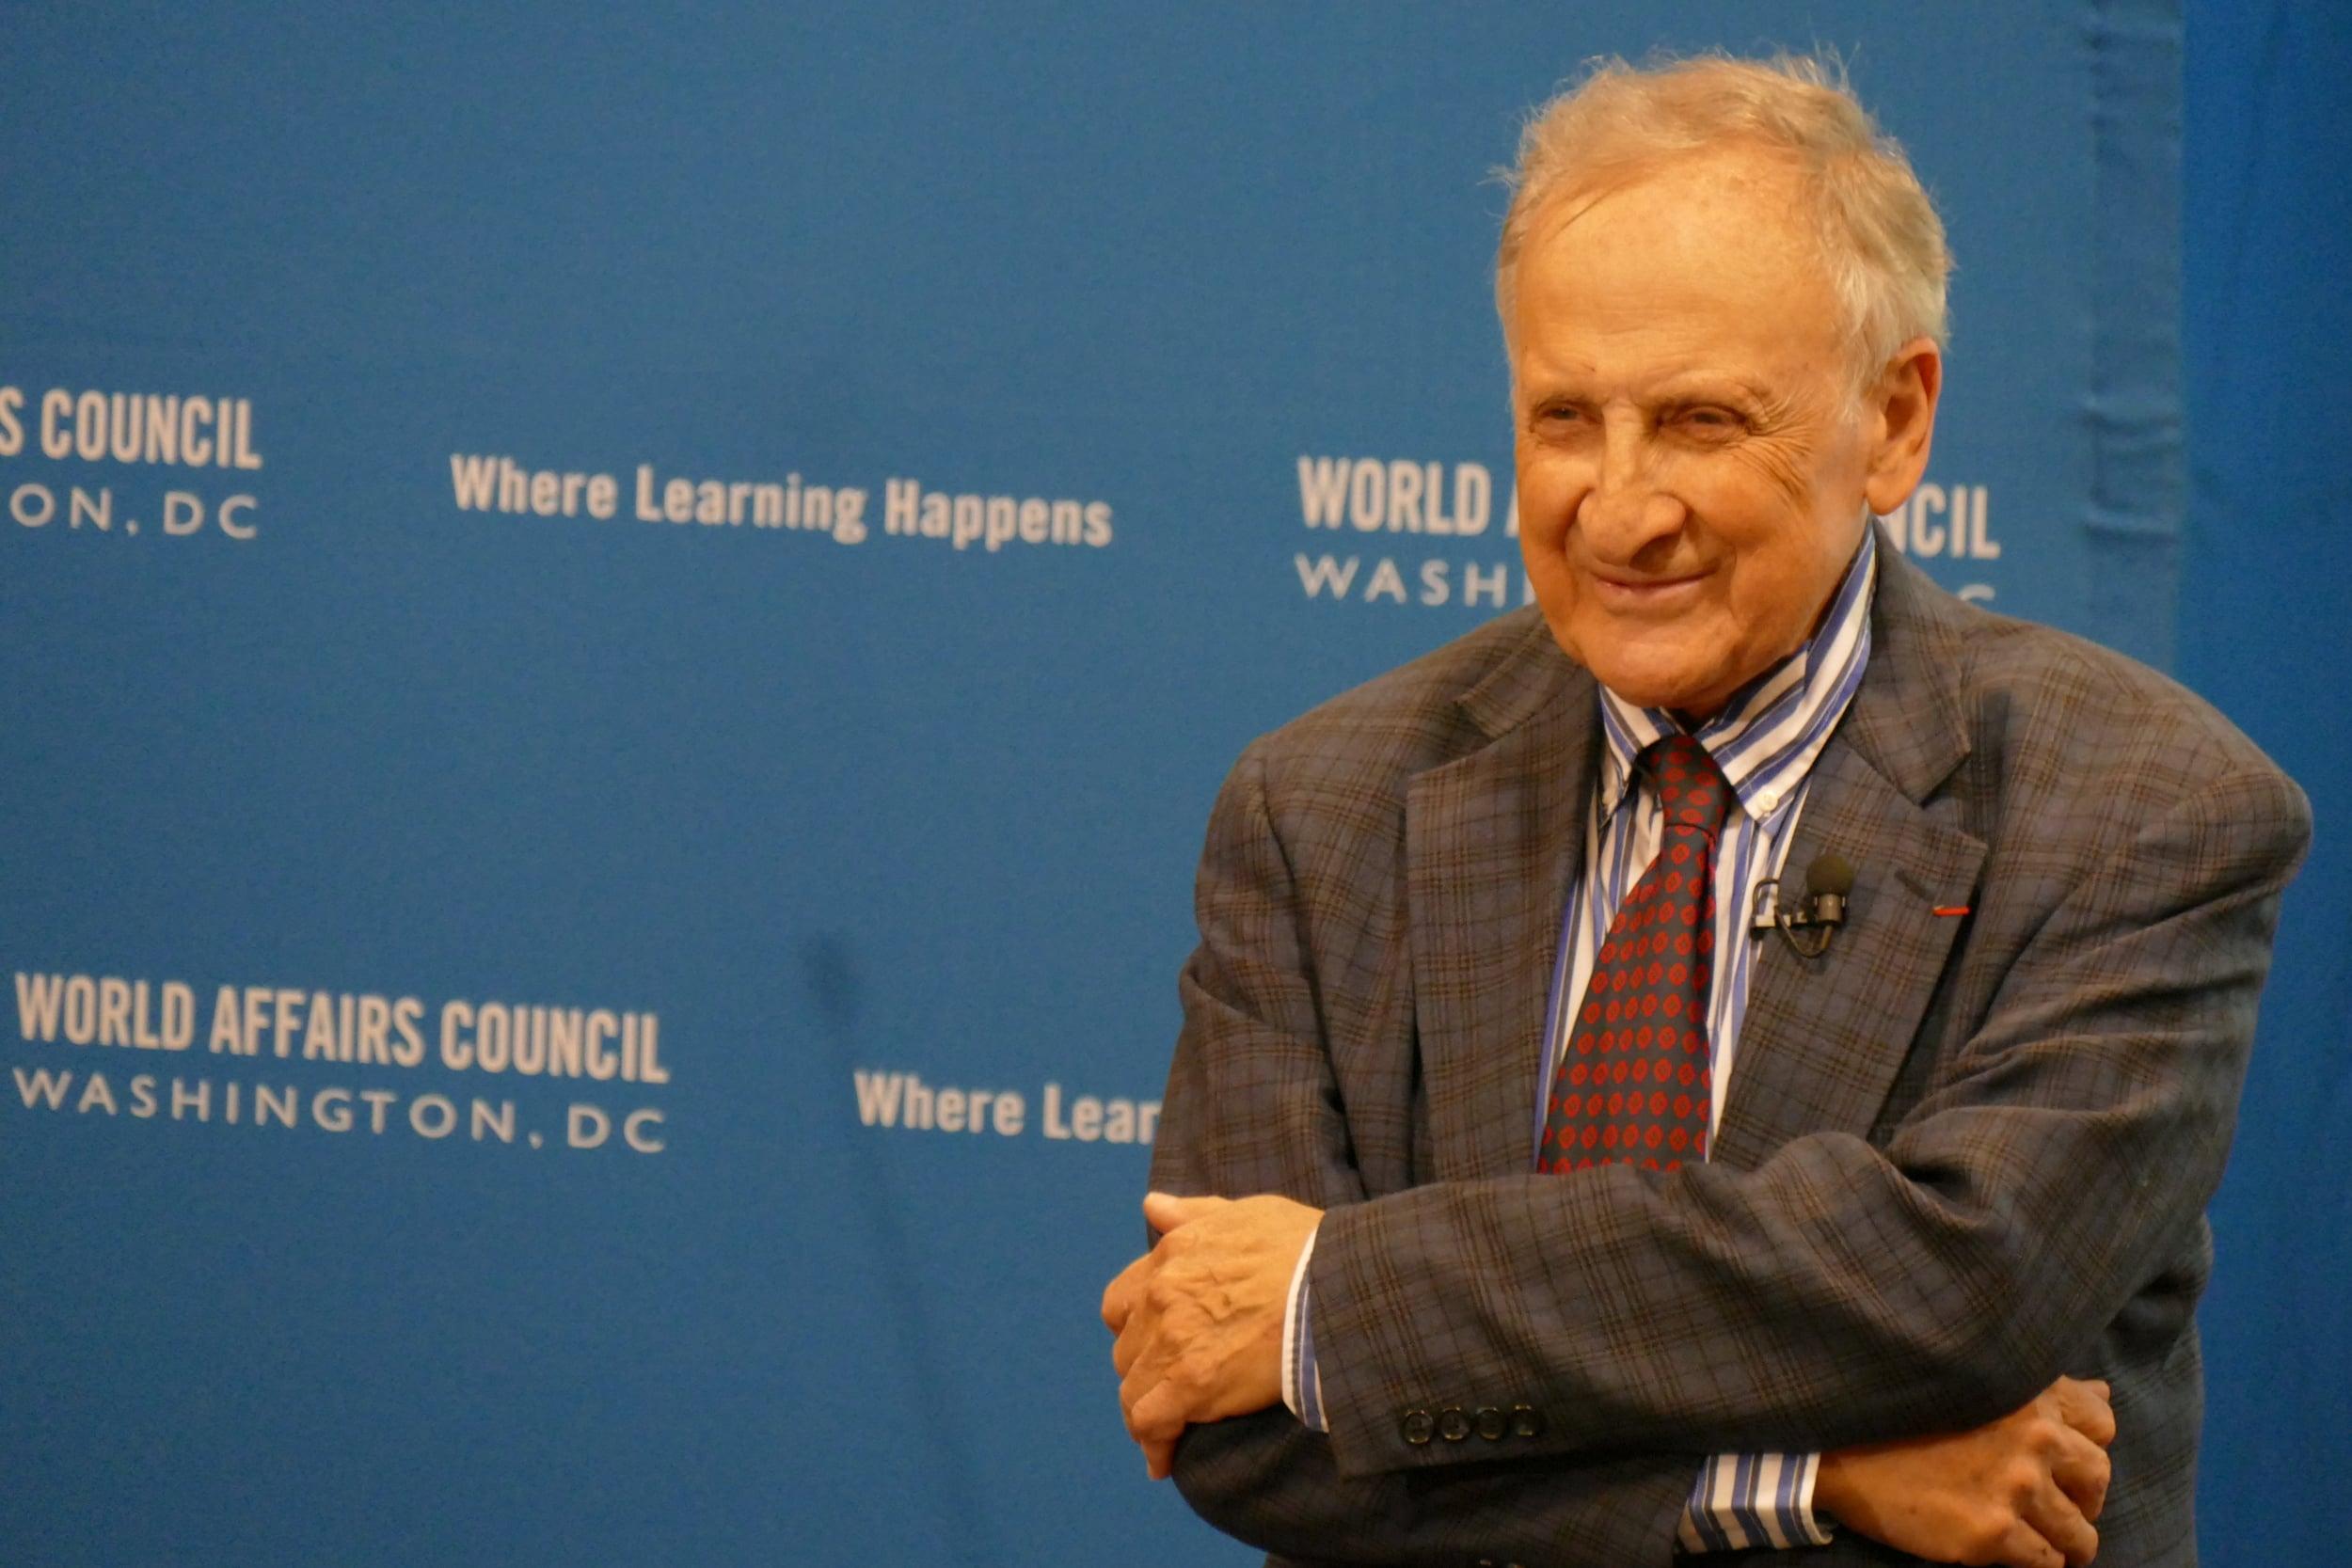 At Washington, DC's World Affairs Council